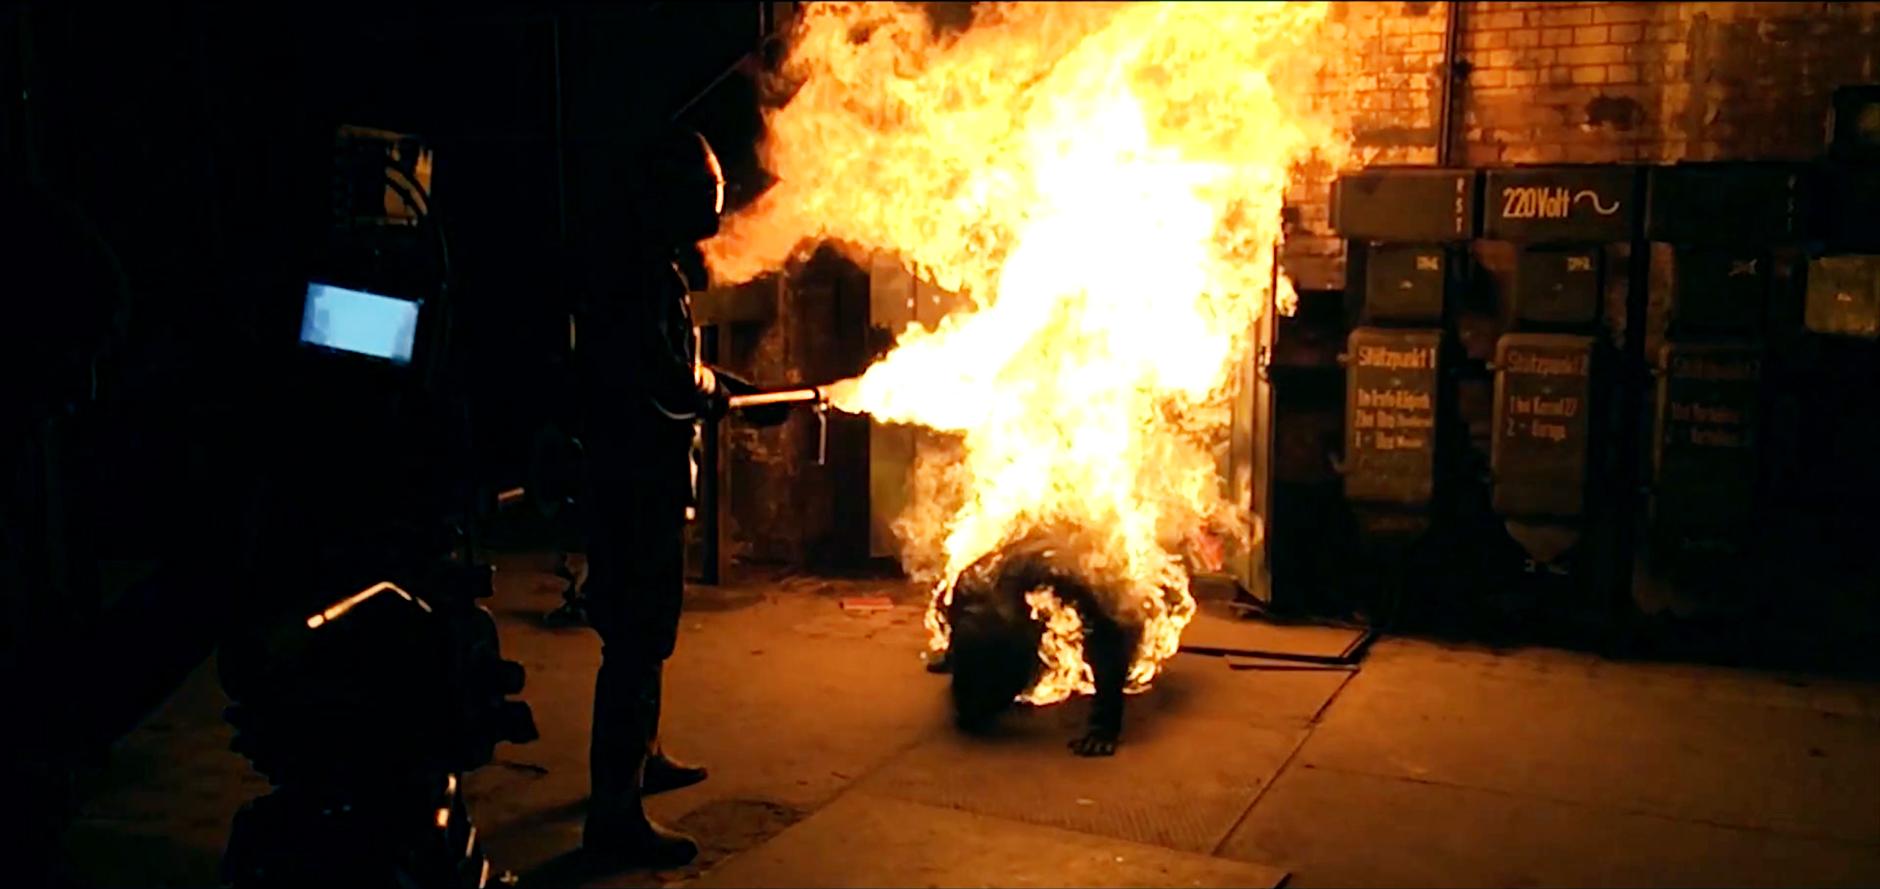 MG Action, Martin Goeres, Phoenix, Flamethrower